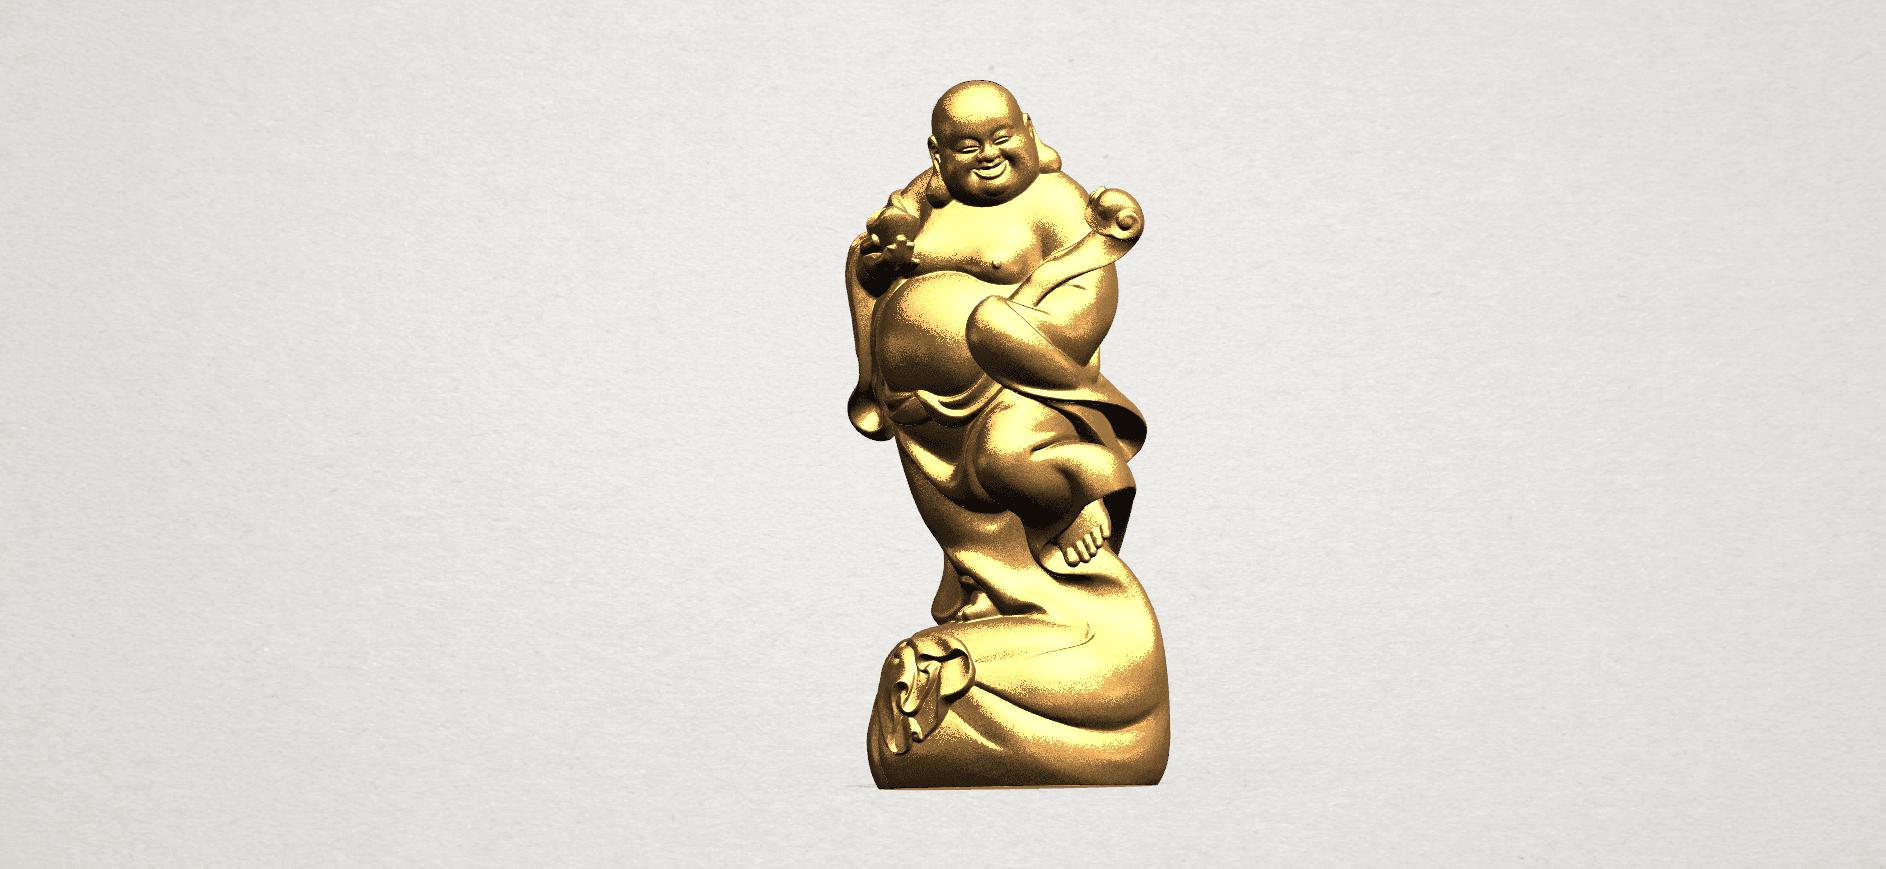 TDA0070 Metteyya Buddha 04 - 88mm - A02.png Download free STL file Metteyya Buddha 04 • 3D printable object, GeorgesNikkei